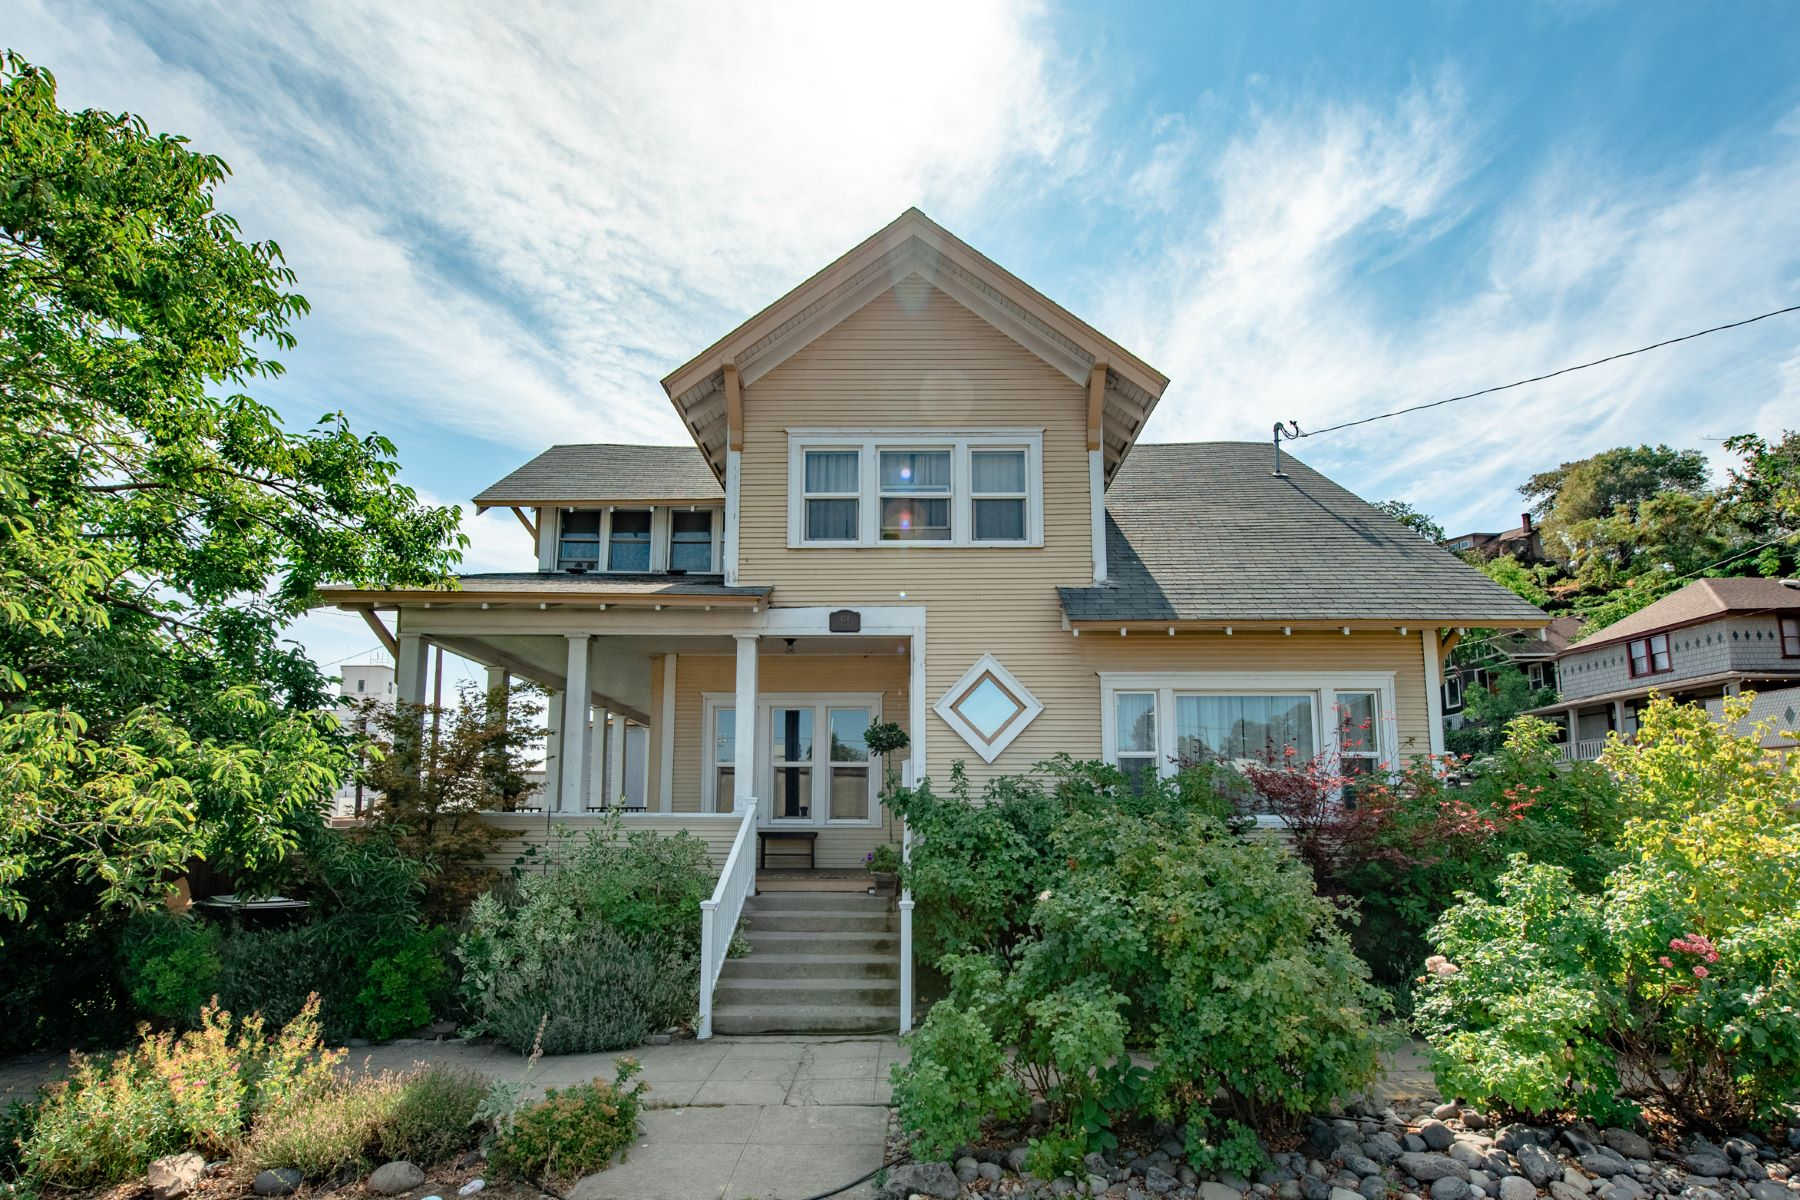 Other Residential Homes για την Πώληση στο 414 JEFFERSON The Dalles, OR 97058 The Dalles, Ορεγκον 97058 Ηνωμένες Πολιτείες